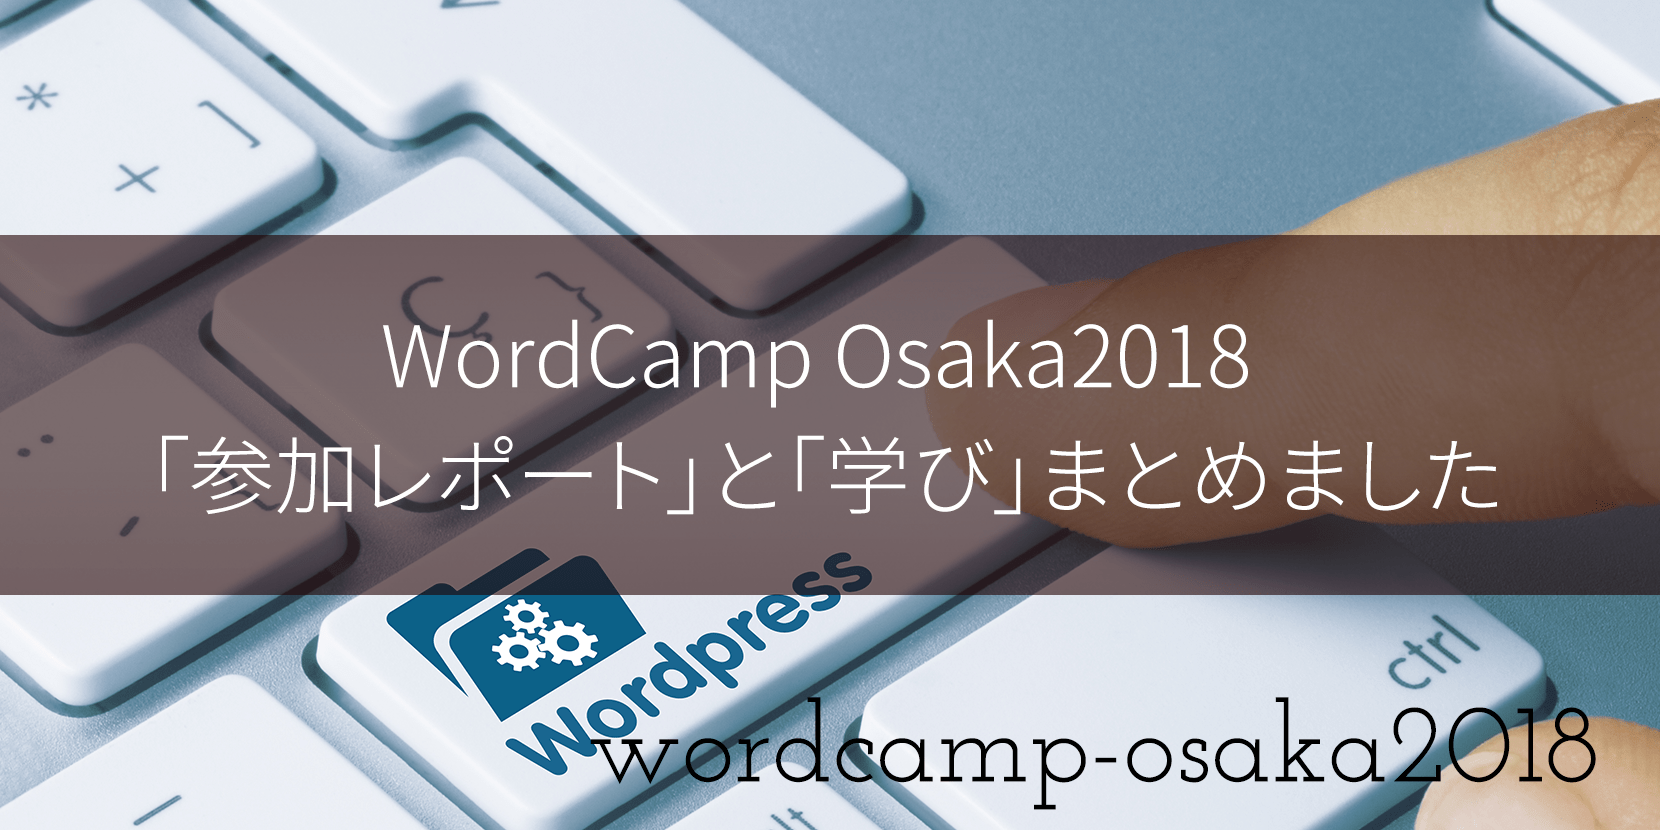 WordCamp Osaka2018 「参加レポート」と「学び」まとめました